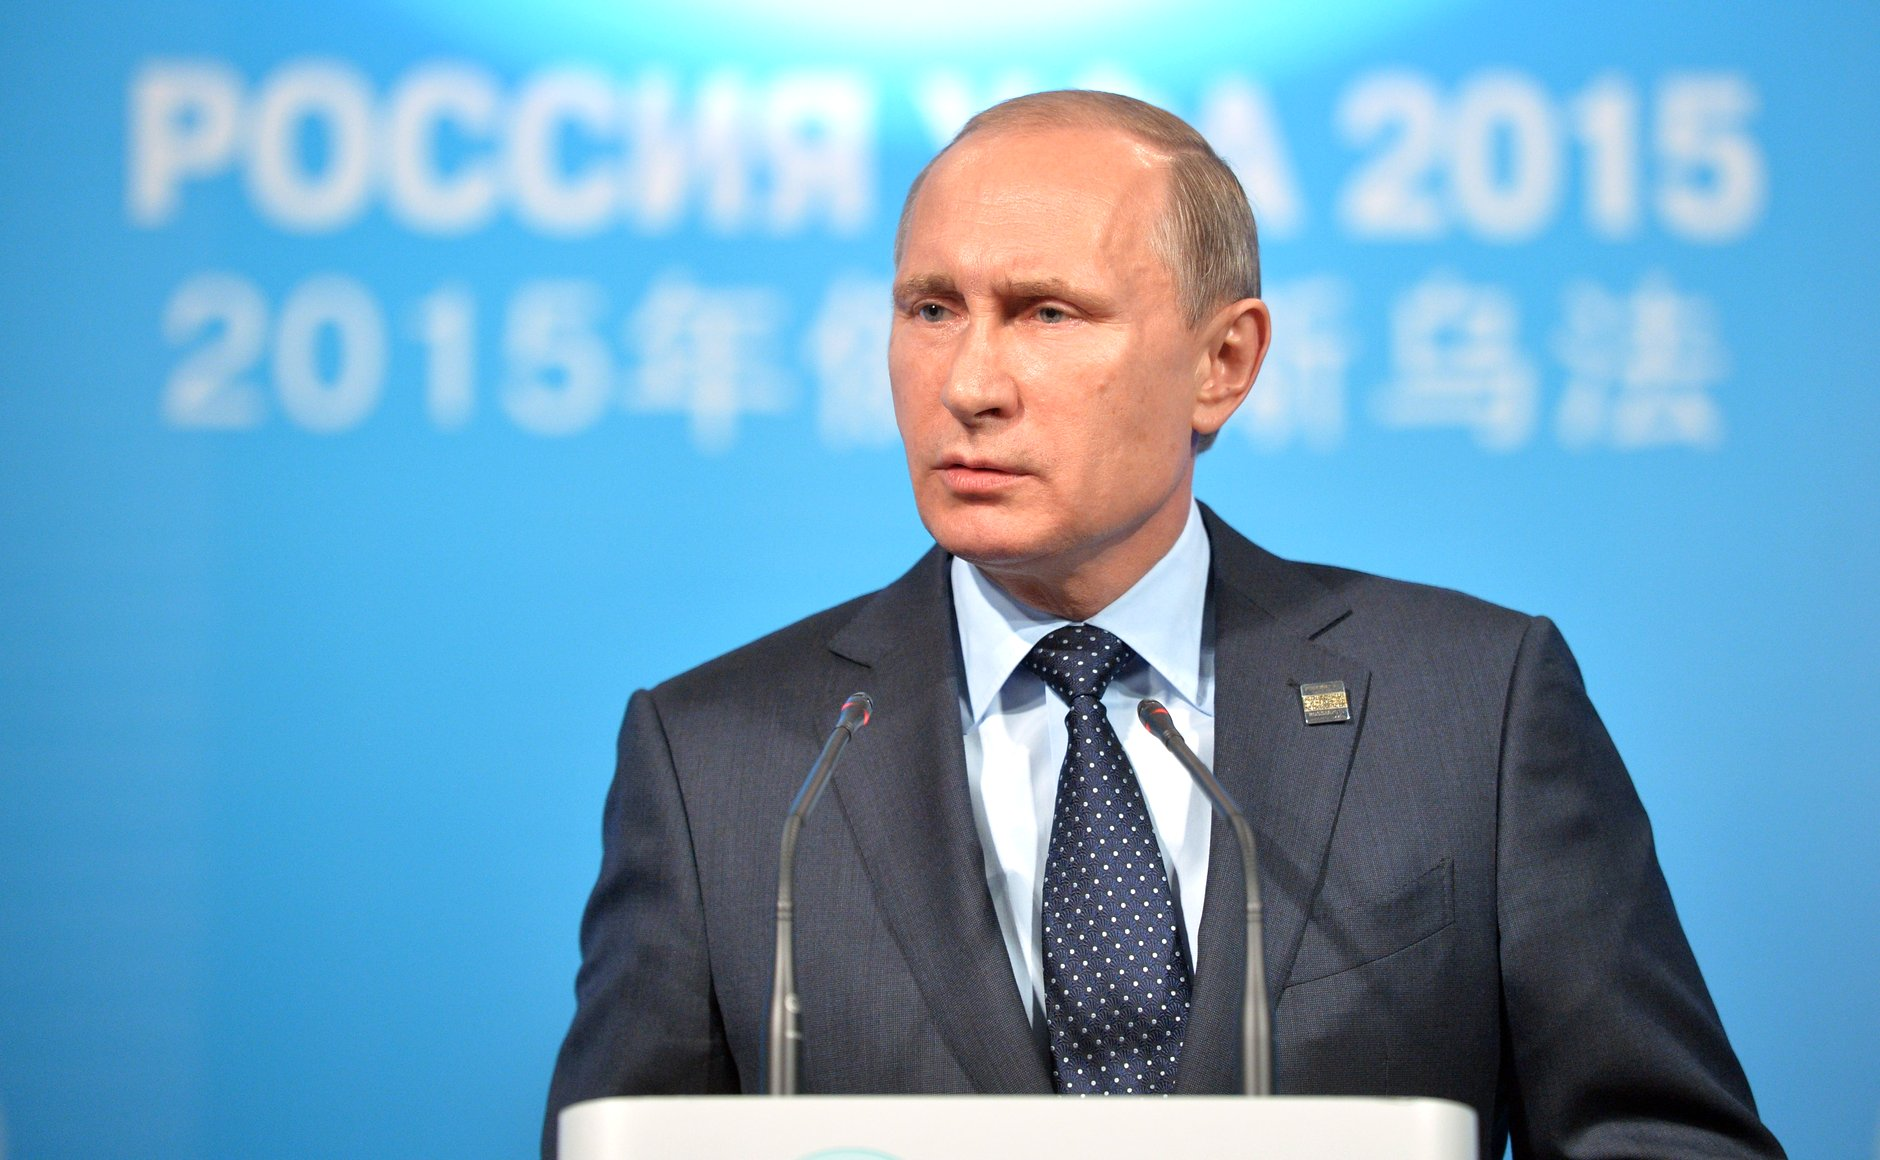 Press-Conference_of_Vladimir_Putin,_(2015-07-10)_01